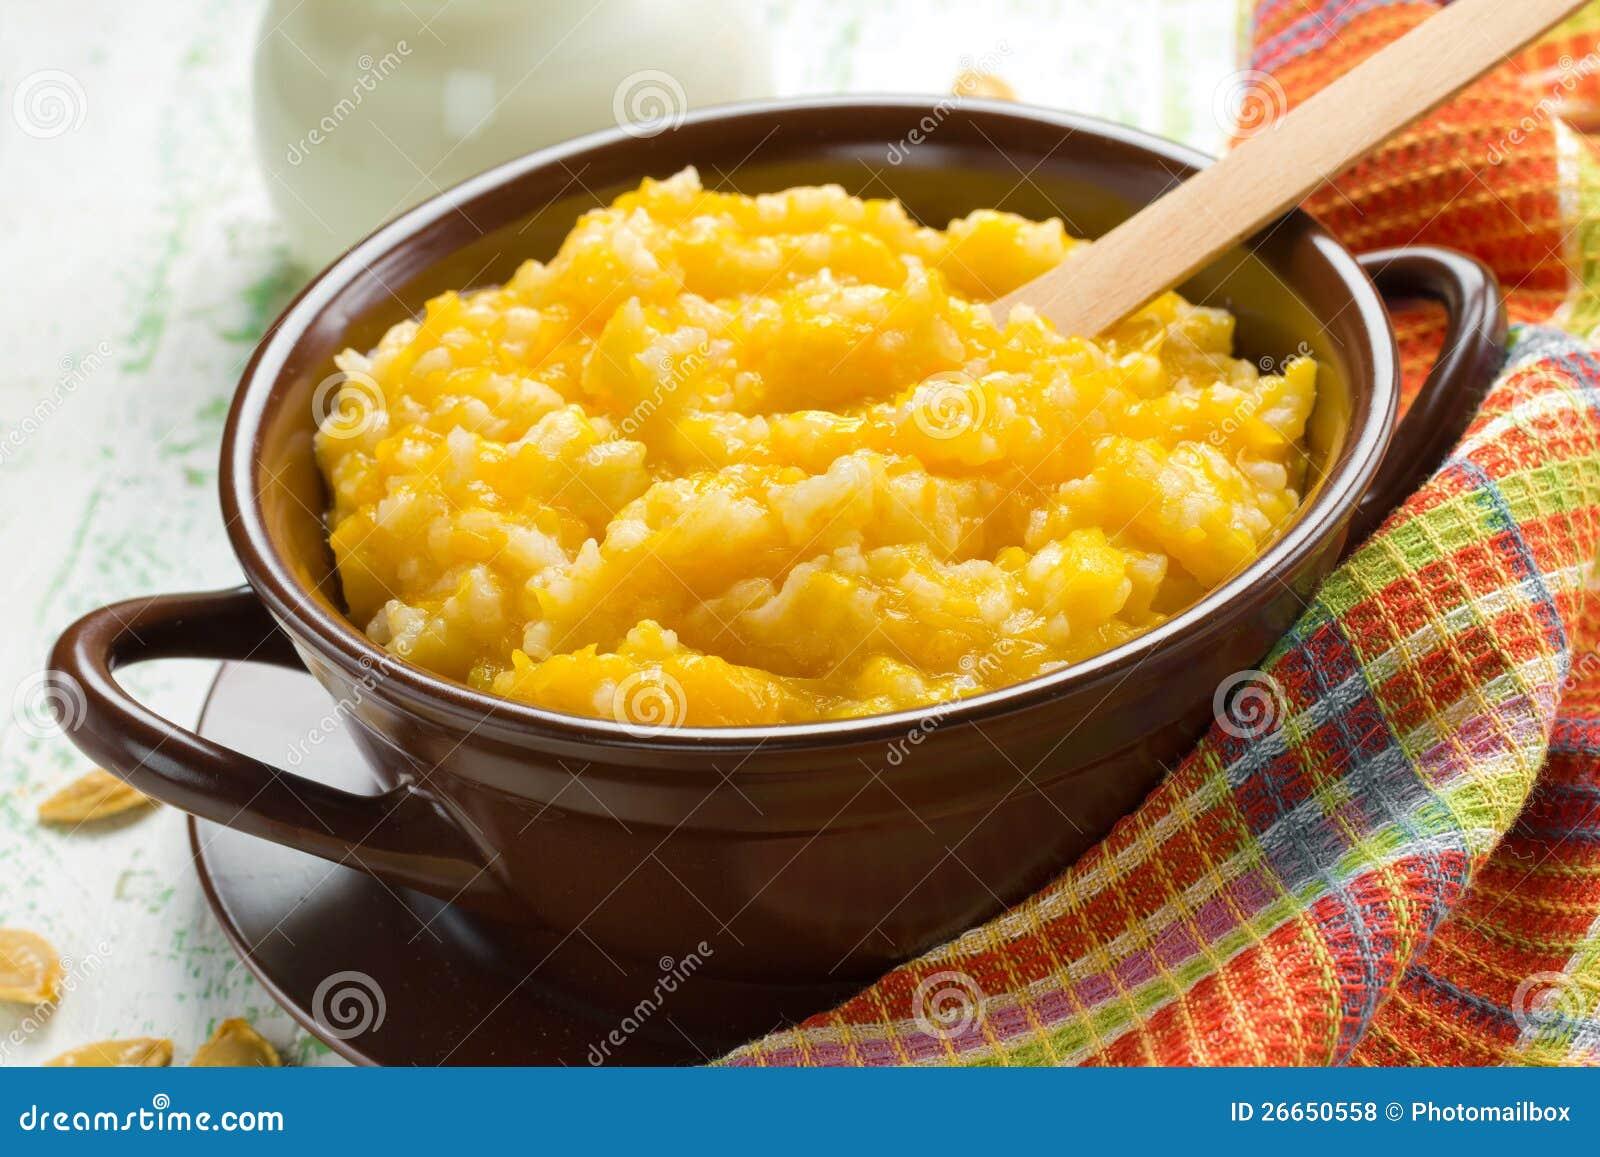 how to cook korean pumpkin porridge